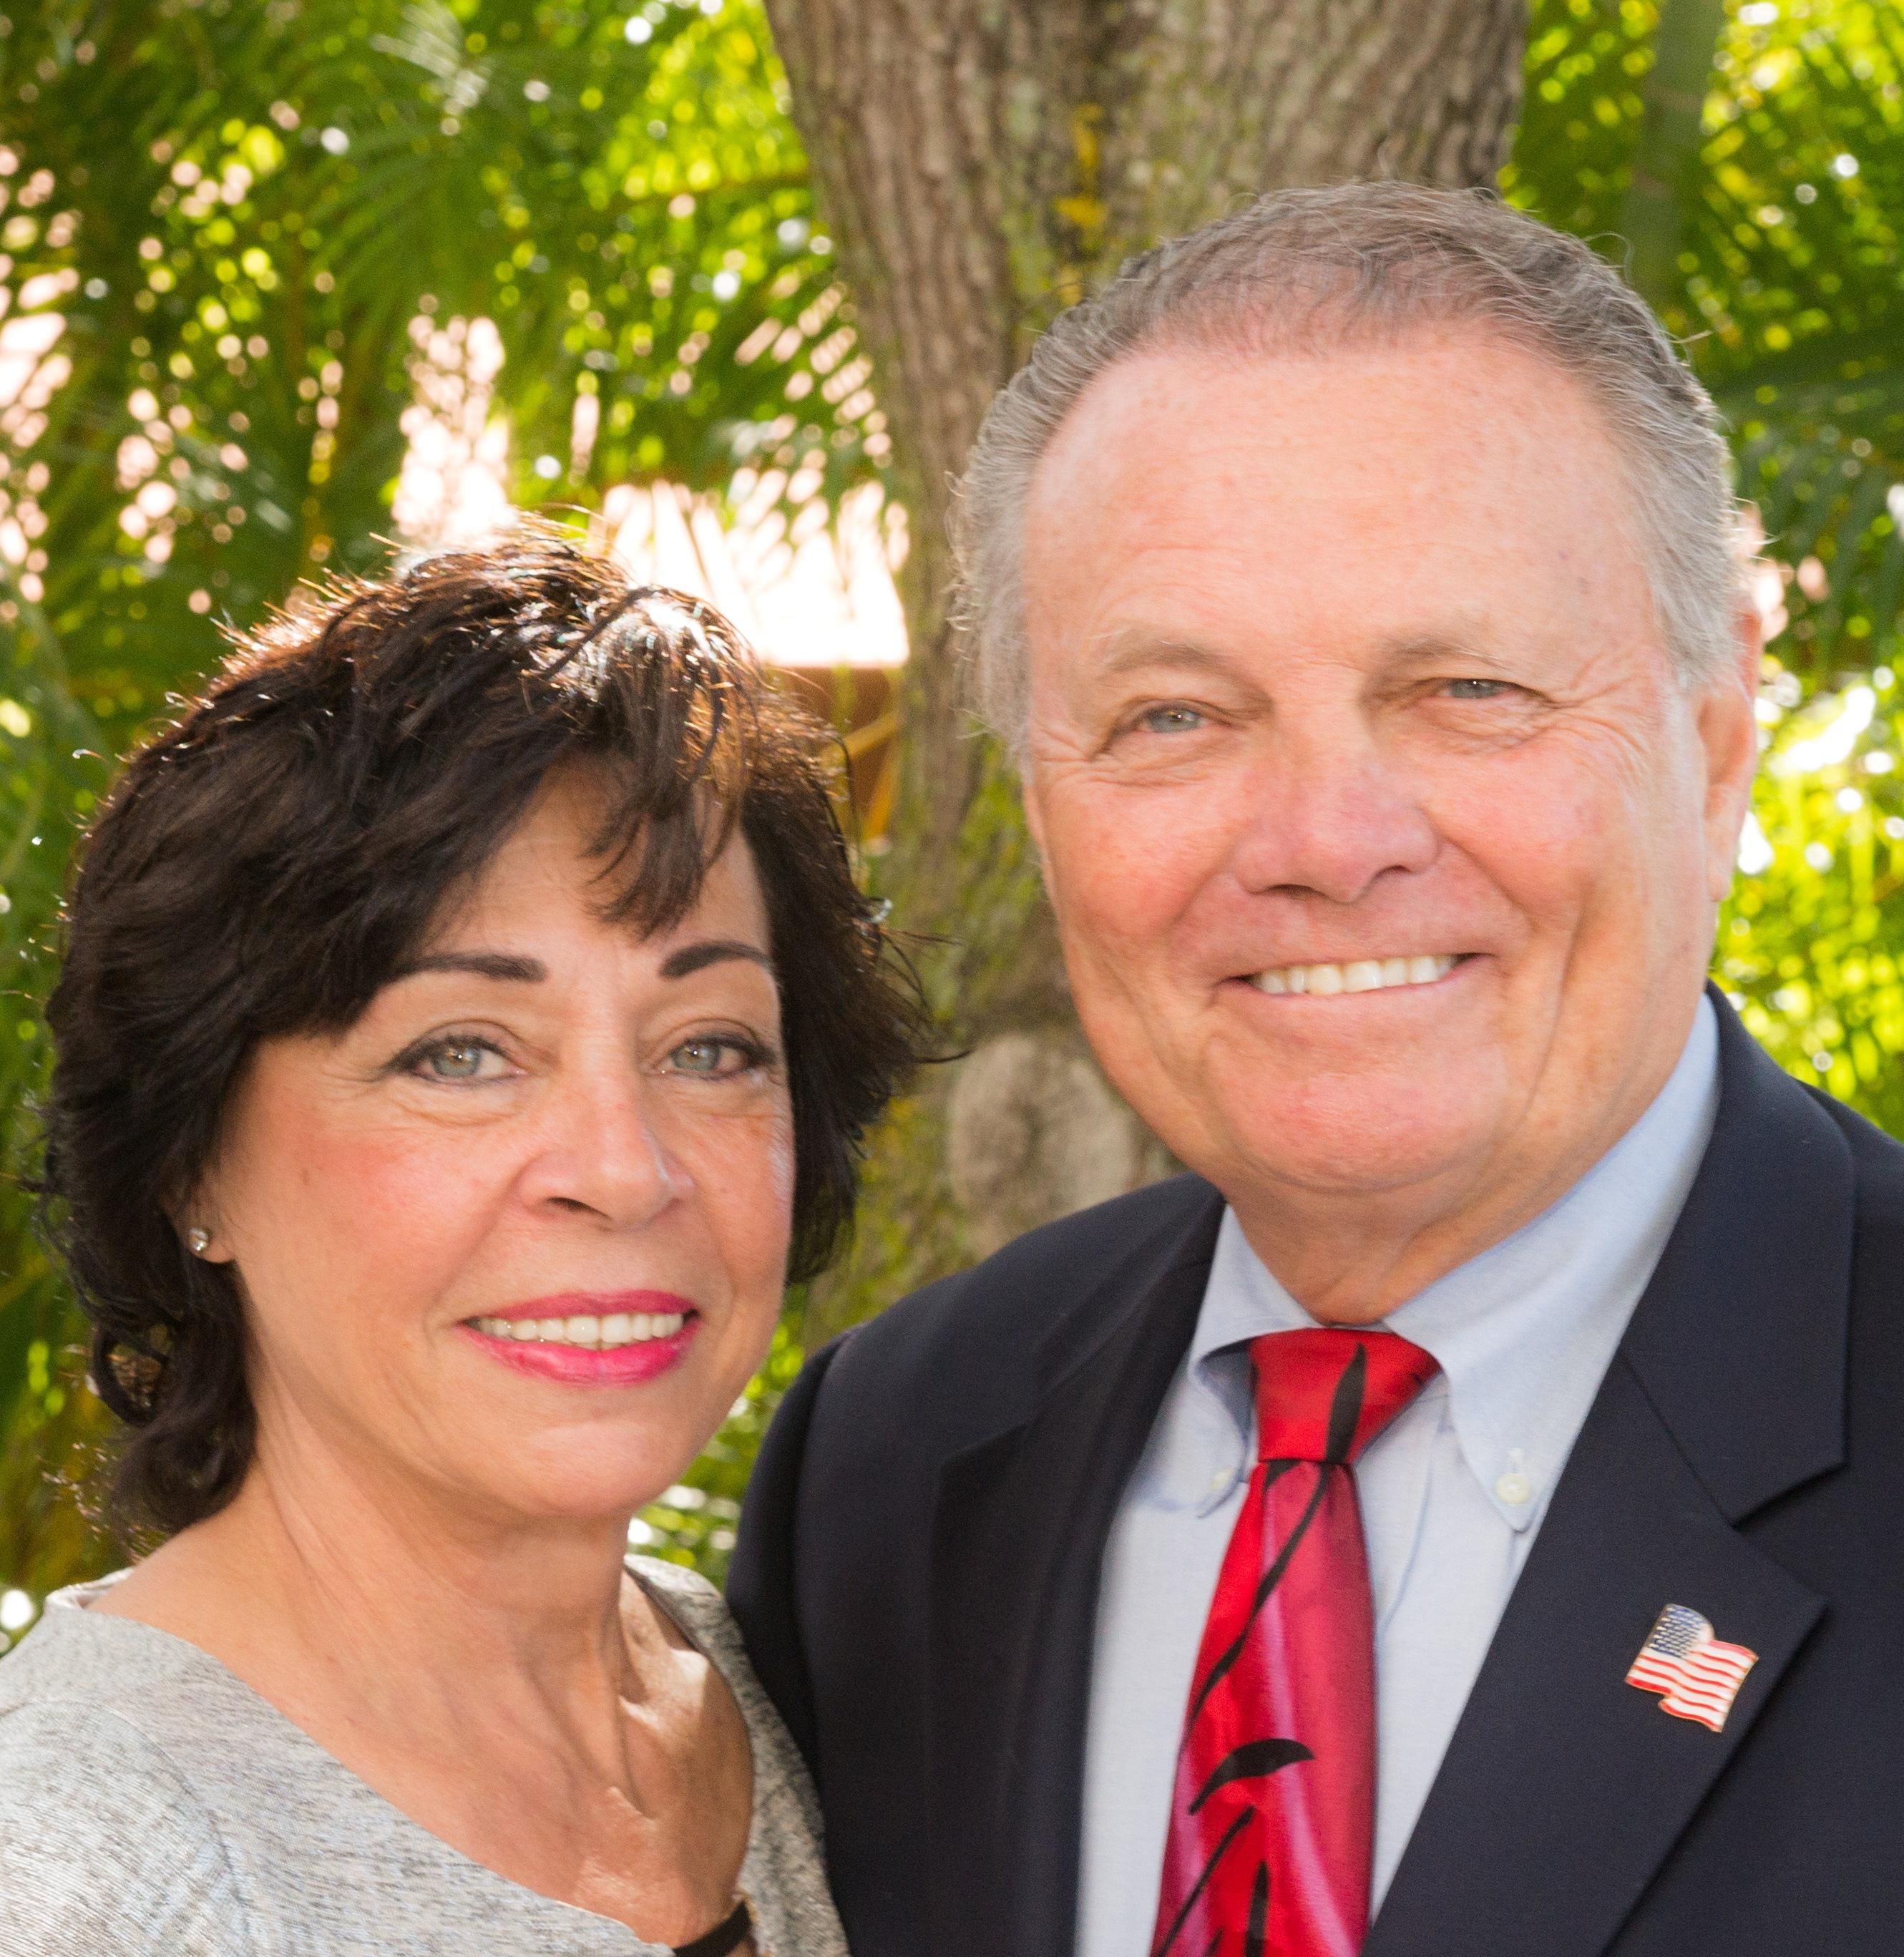 Glen and Lillian Ridgeway